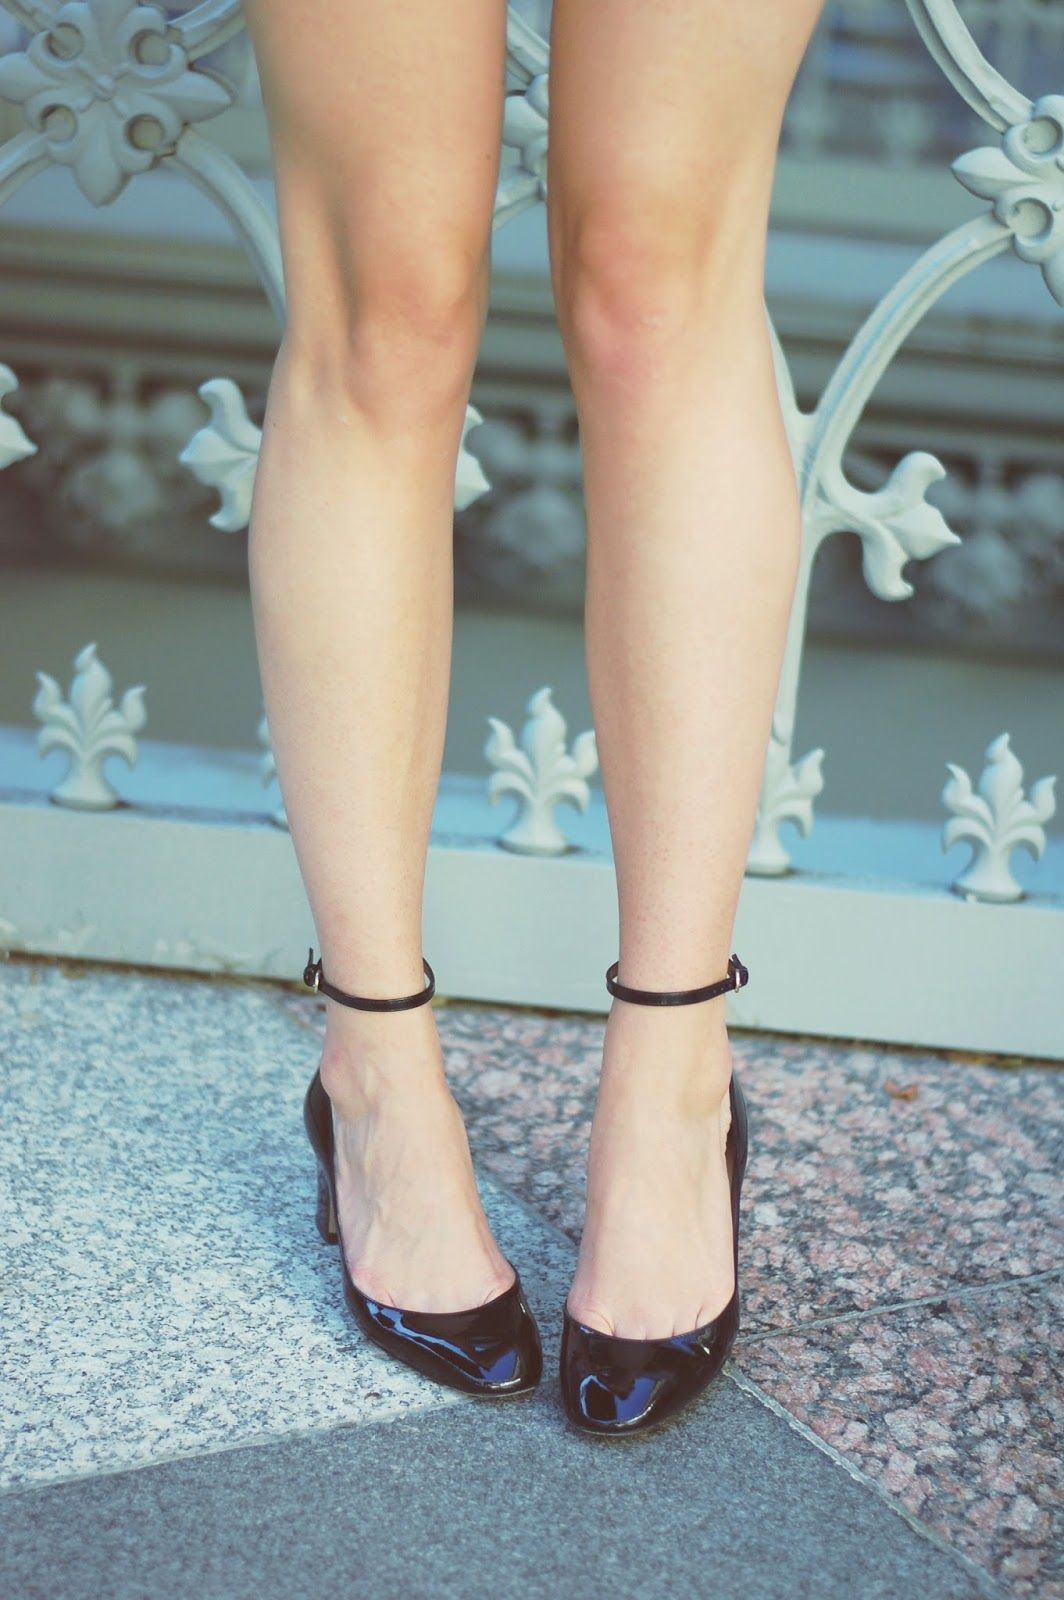 Black, White and Polka Dots   Footwear   Shoes, Polka dots, Vintage ... 5387bbb1c254